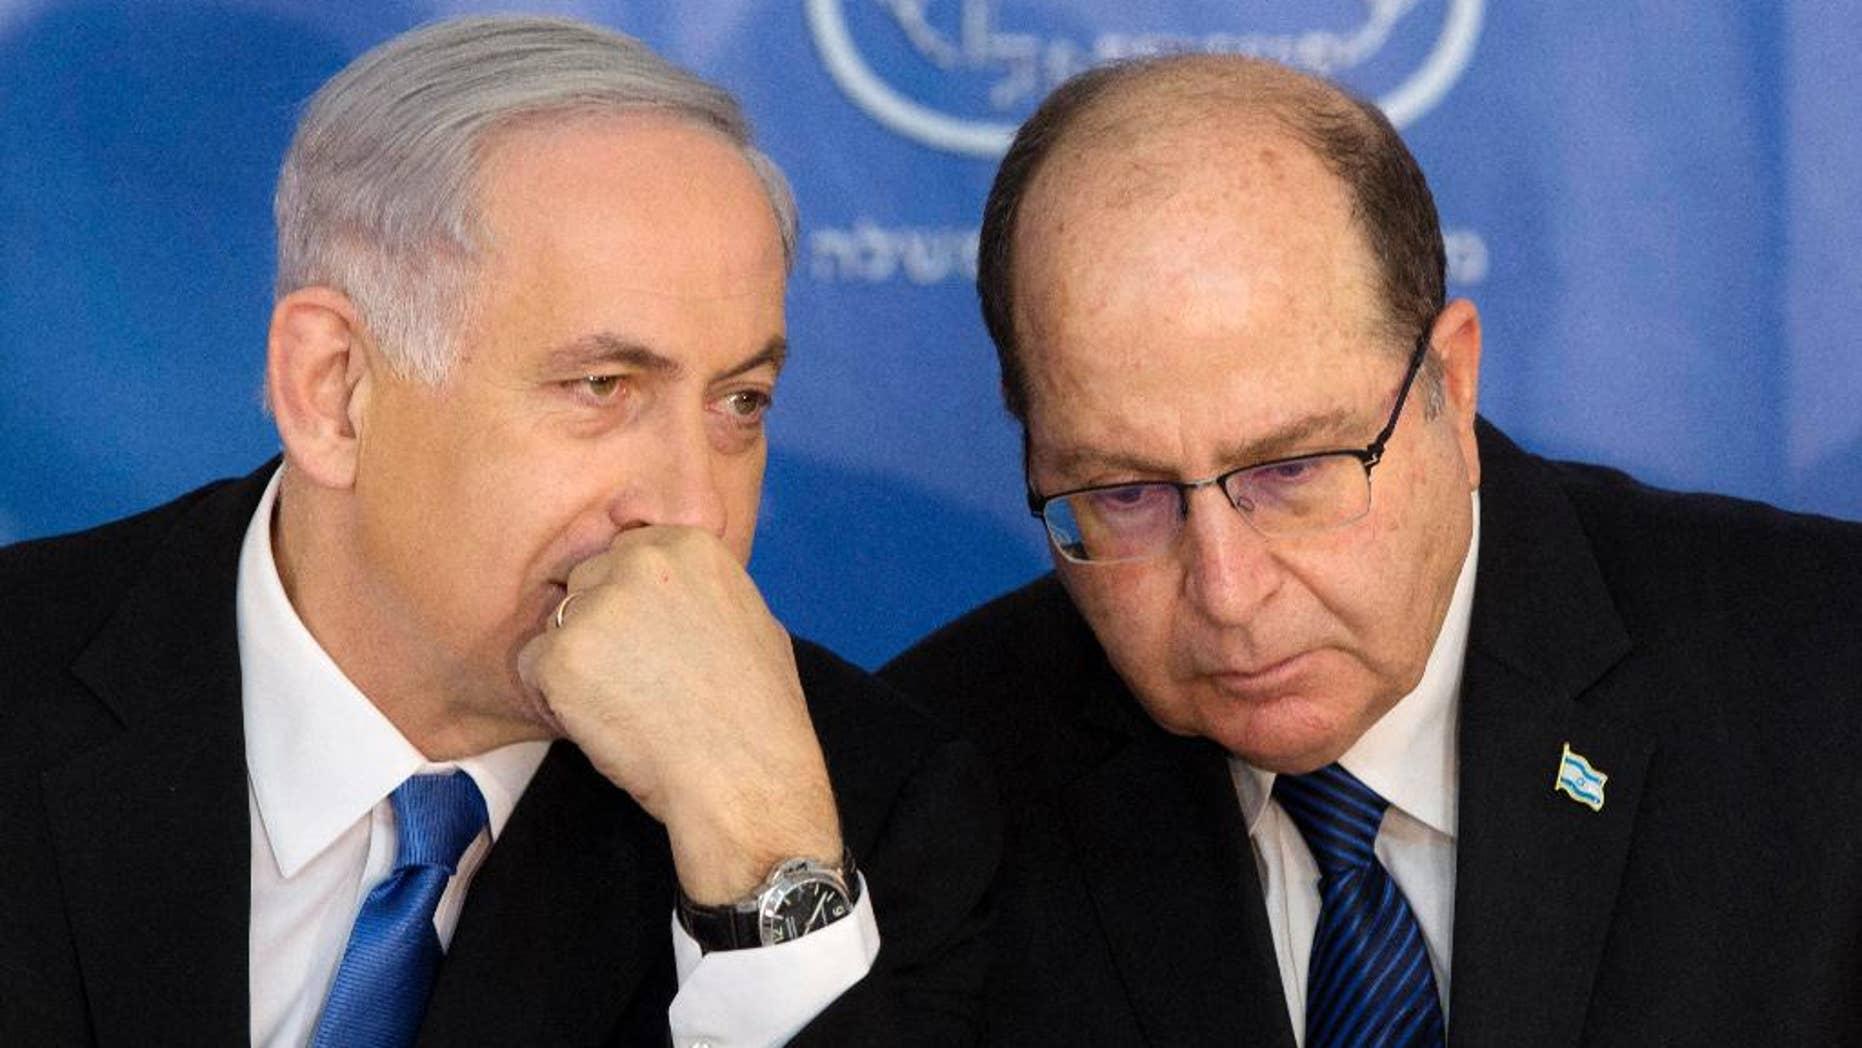 Feb. 16, 2015: Israeli Prime Minister Benjamin Netanyahu, left, speaks with Israel's Defense Minister Moshe Yaalon during a ceremony for new Israeli Chief of Staff Gadi Eizenkot at the Prime Minister's office in Jerusalem.